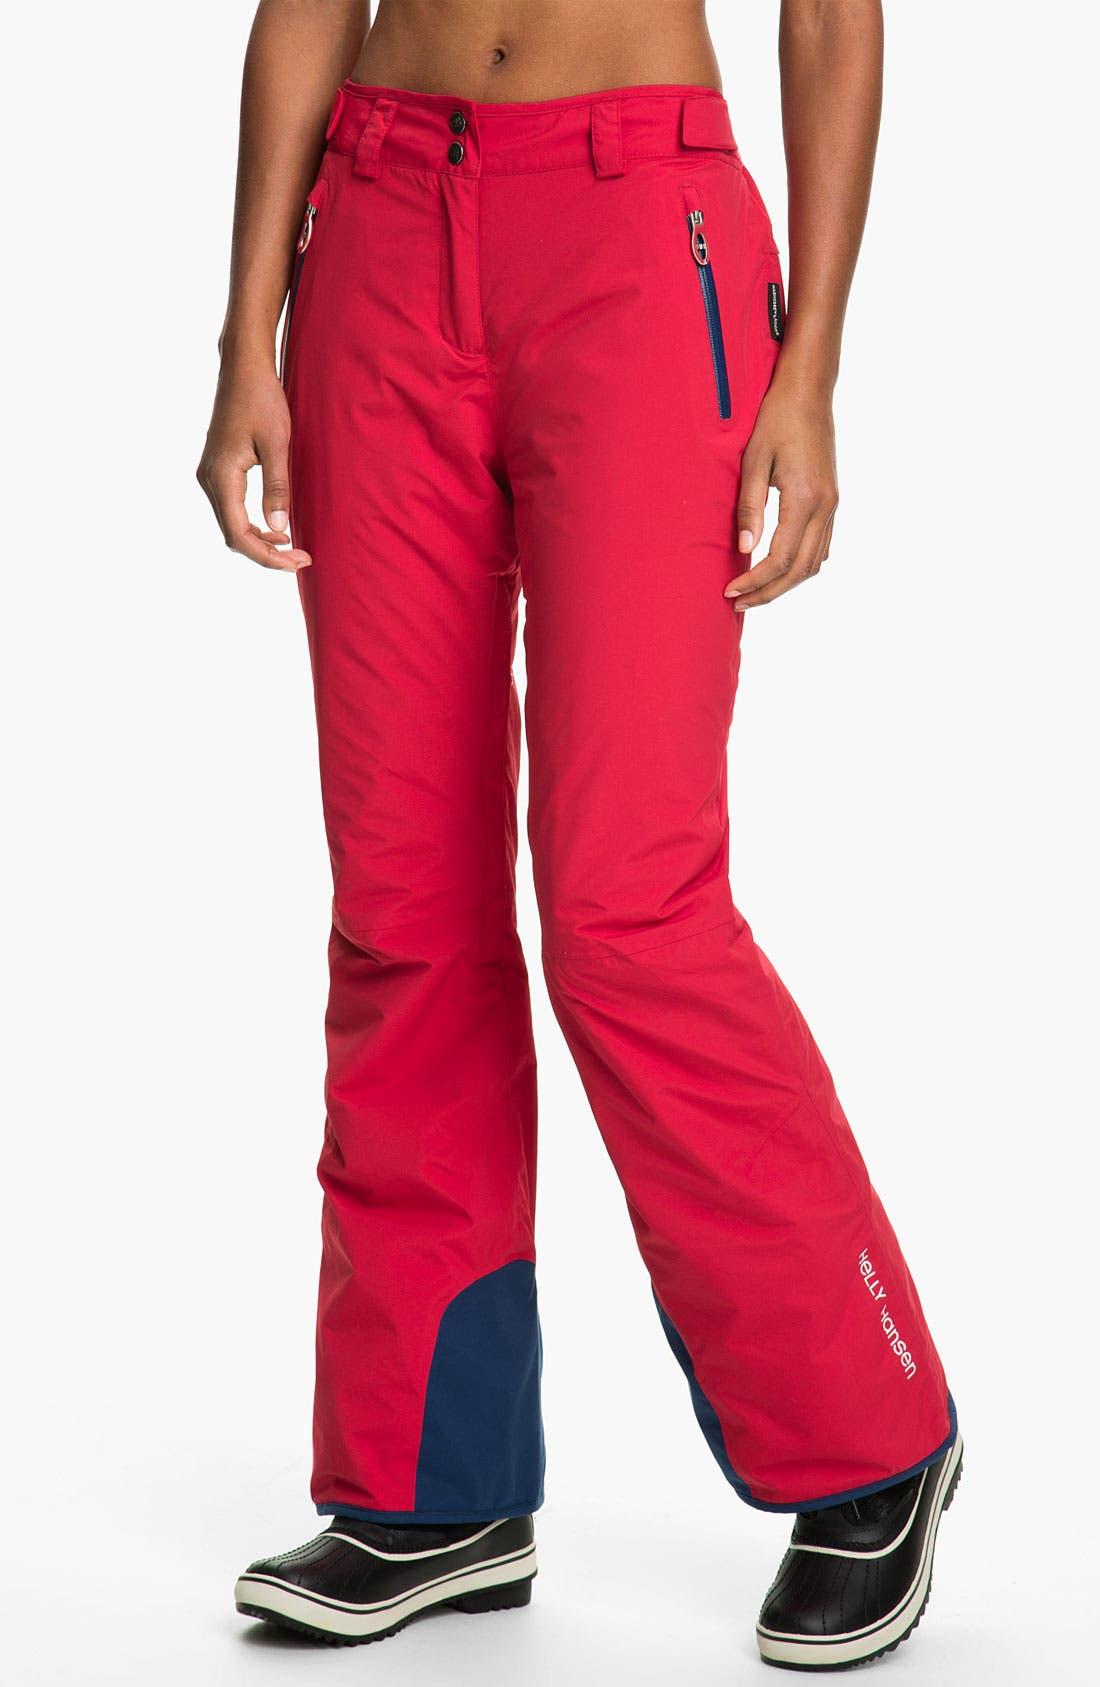 Alternate Image 1 Selected - Helly Hansen 'Legend' Ski Pants